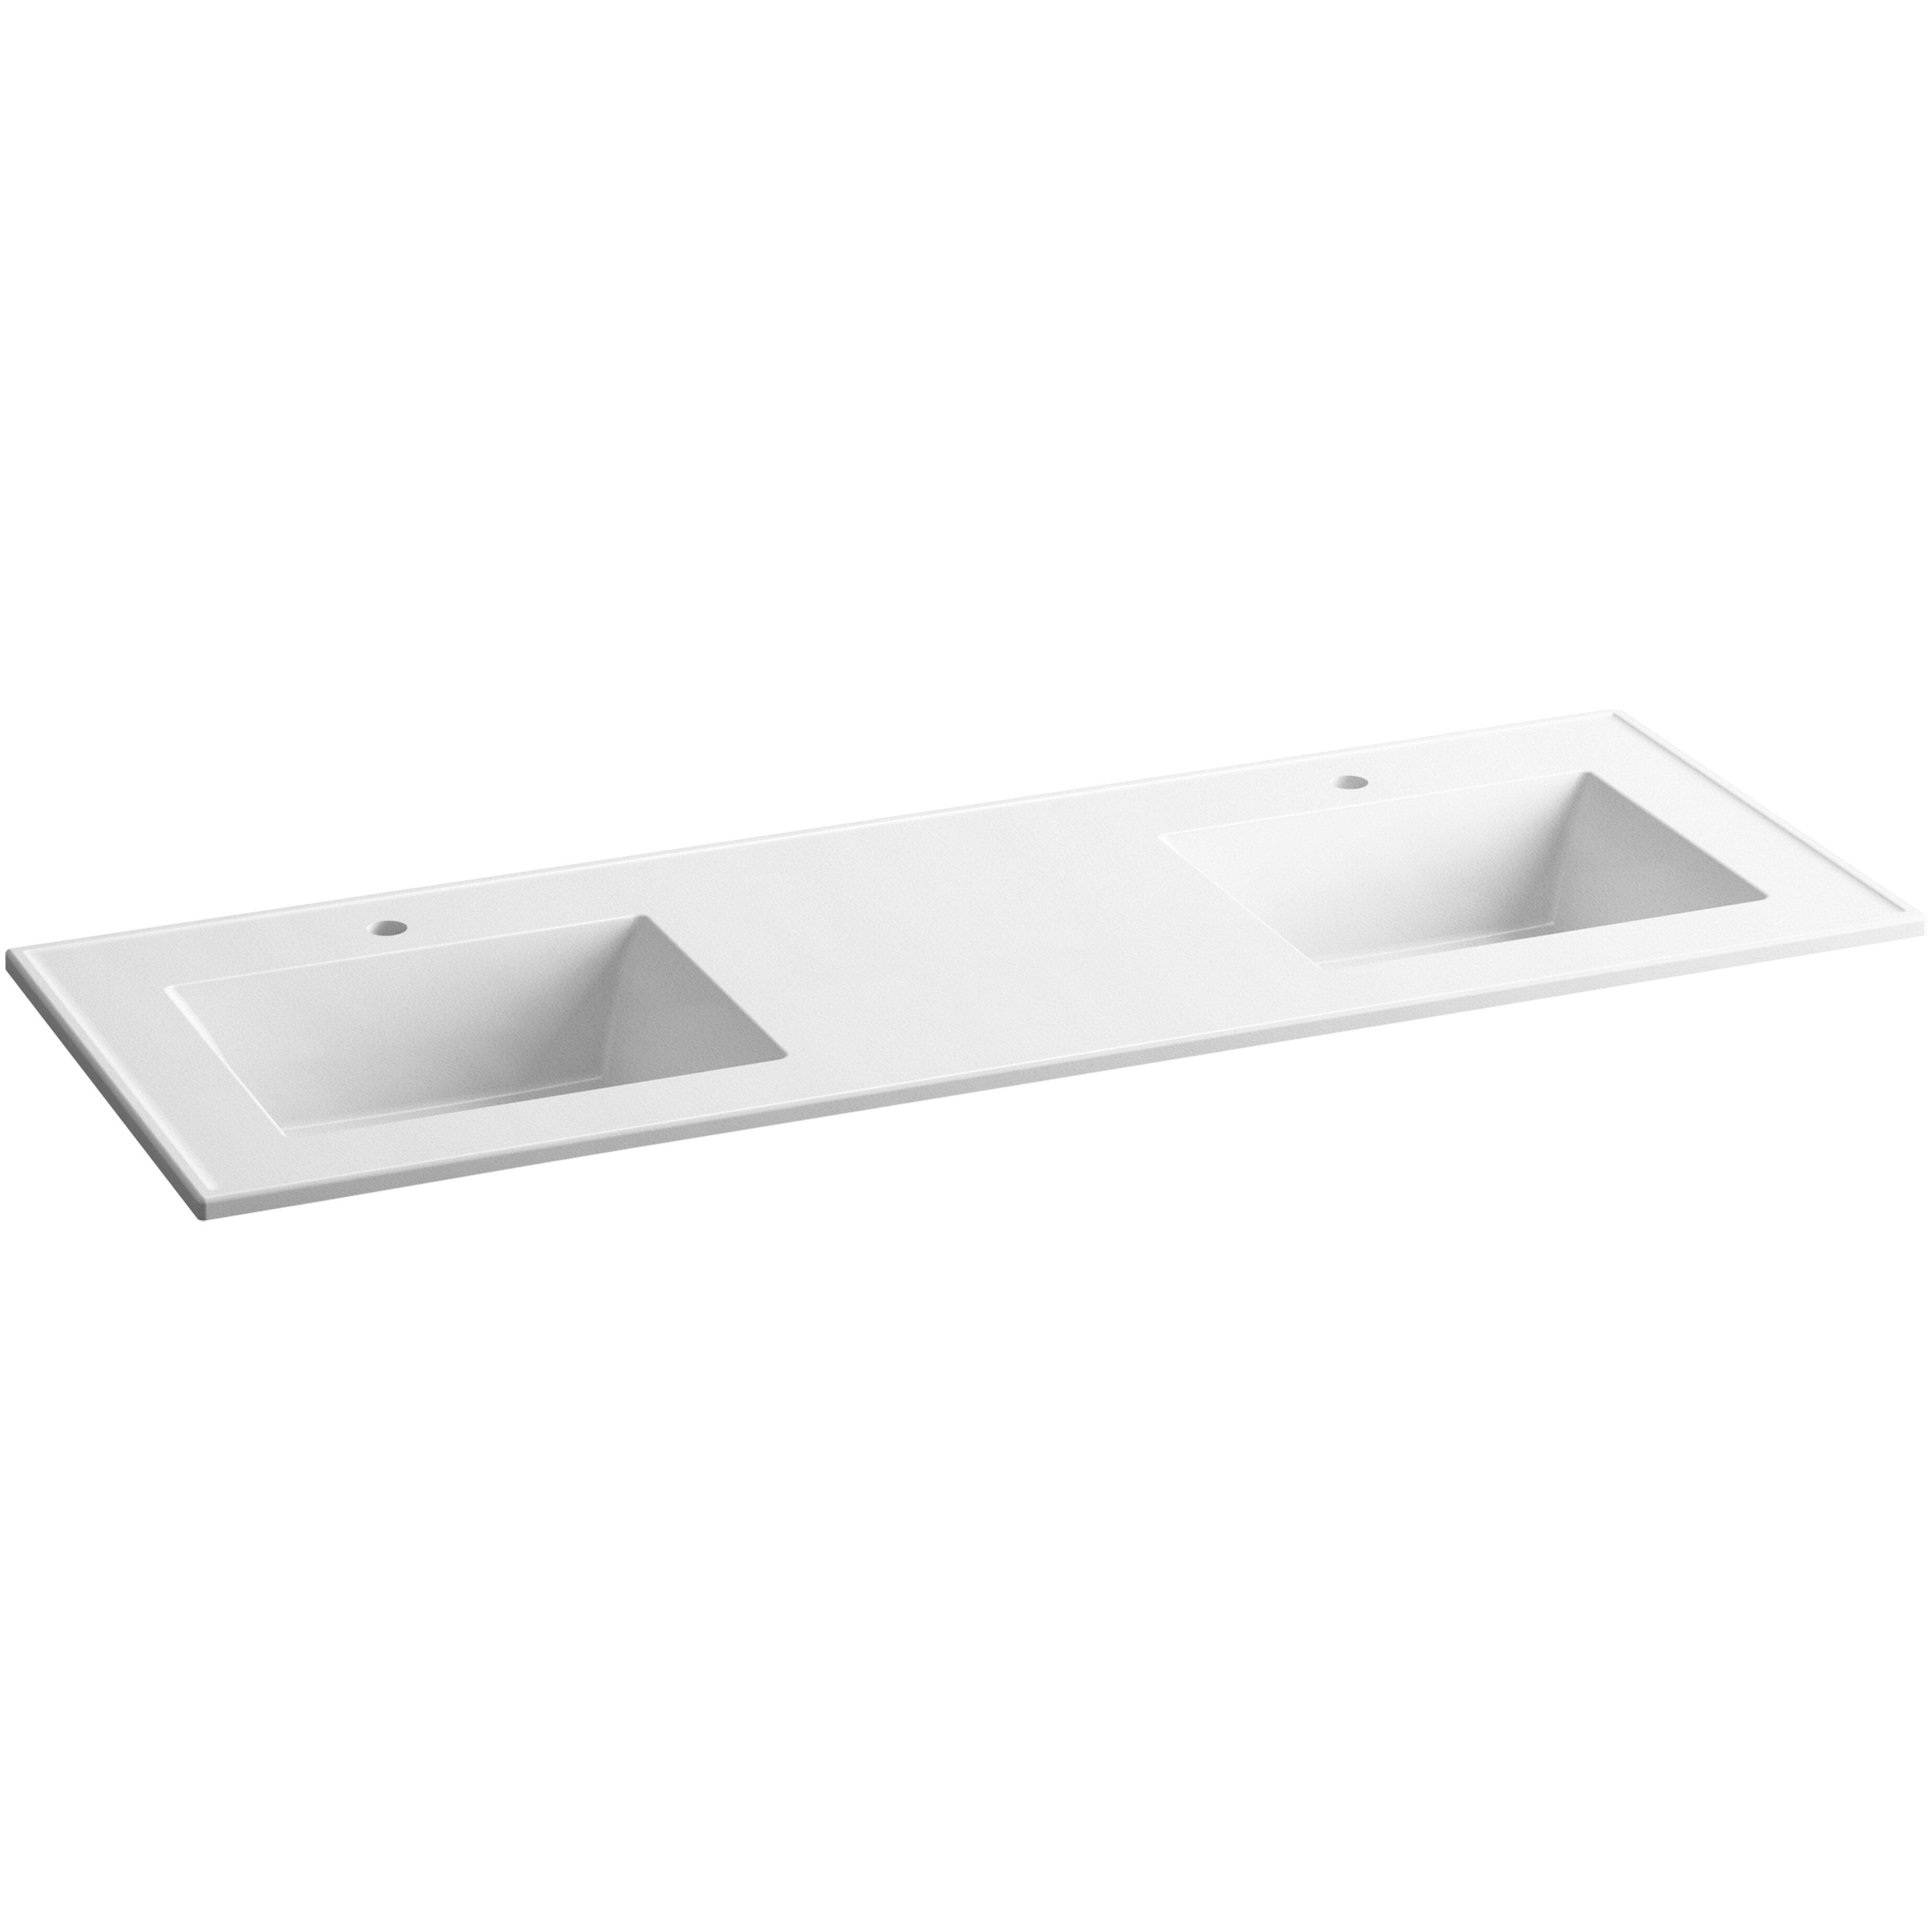 60 inch double sink vanity granite top - Ceramic Impressions 61 Double Bathroom Vanity Top